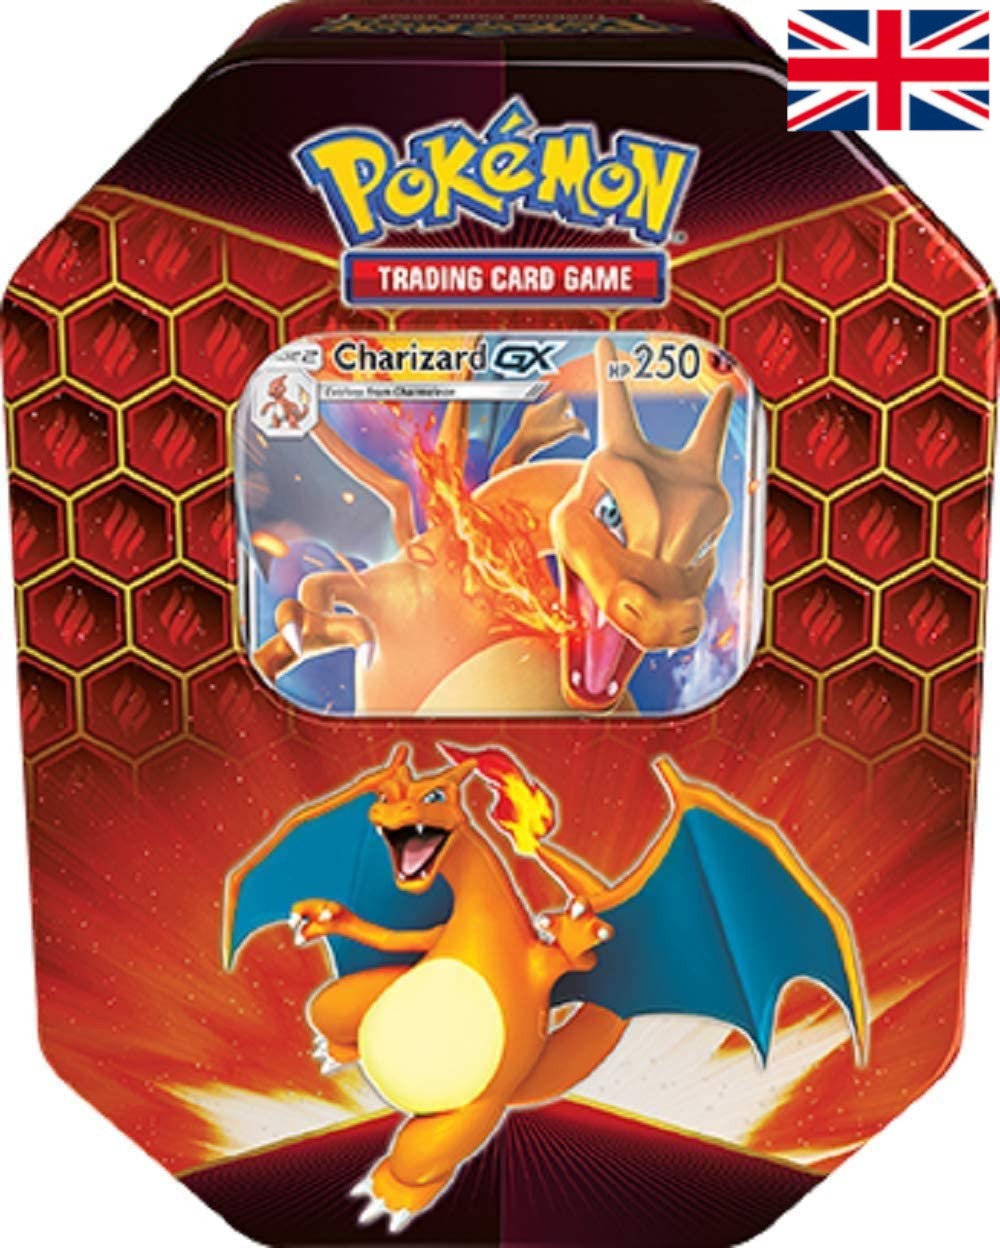 Pokémon - Hidden Fates Tin - Charizard GX